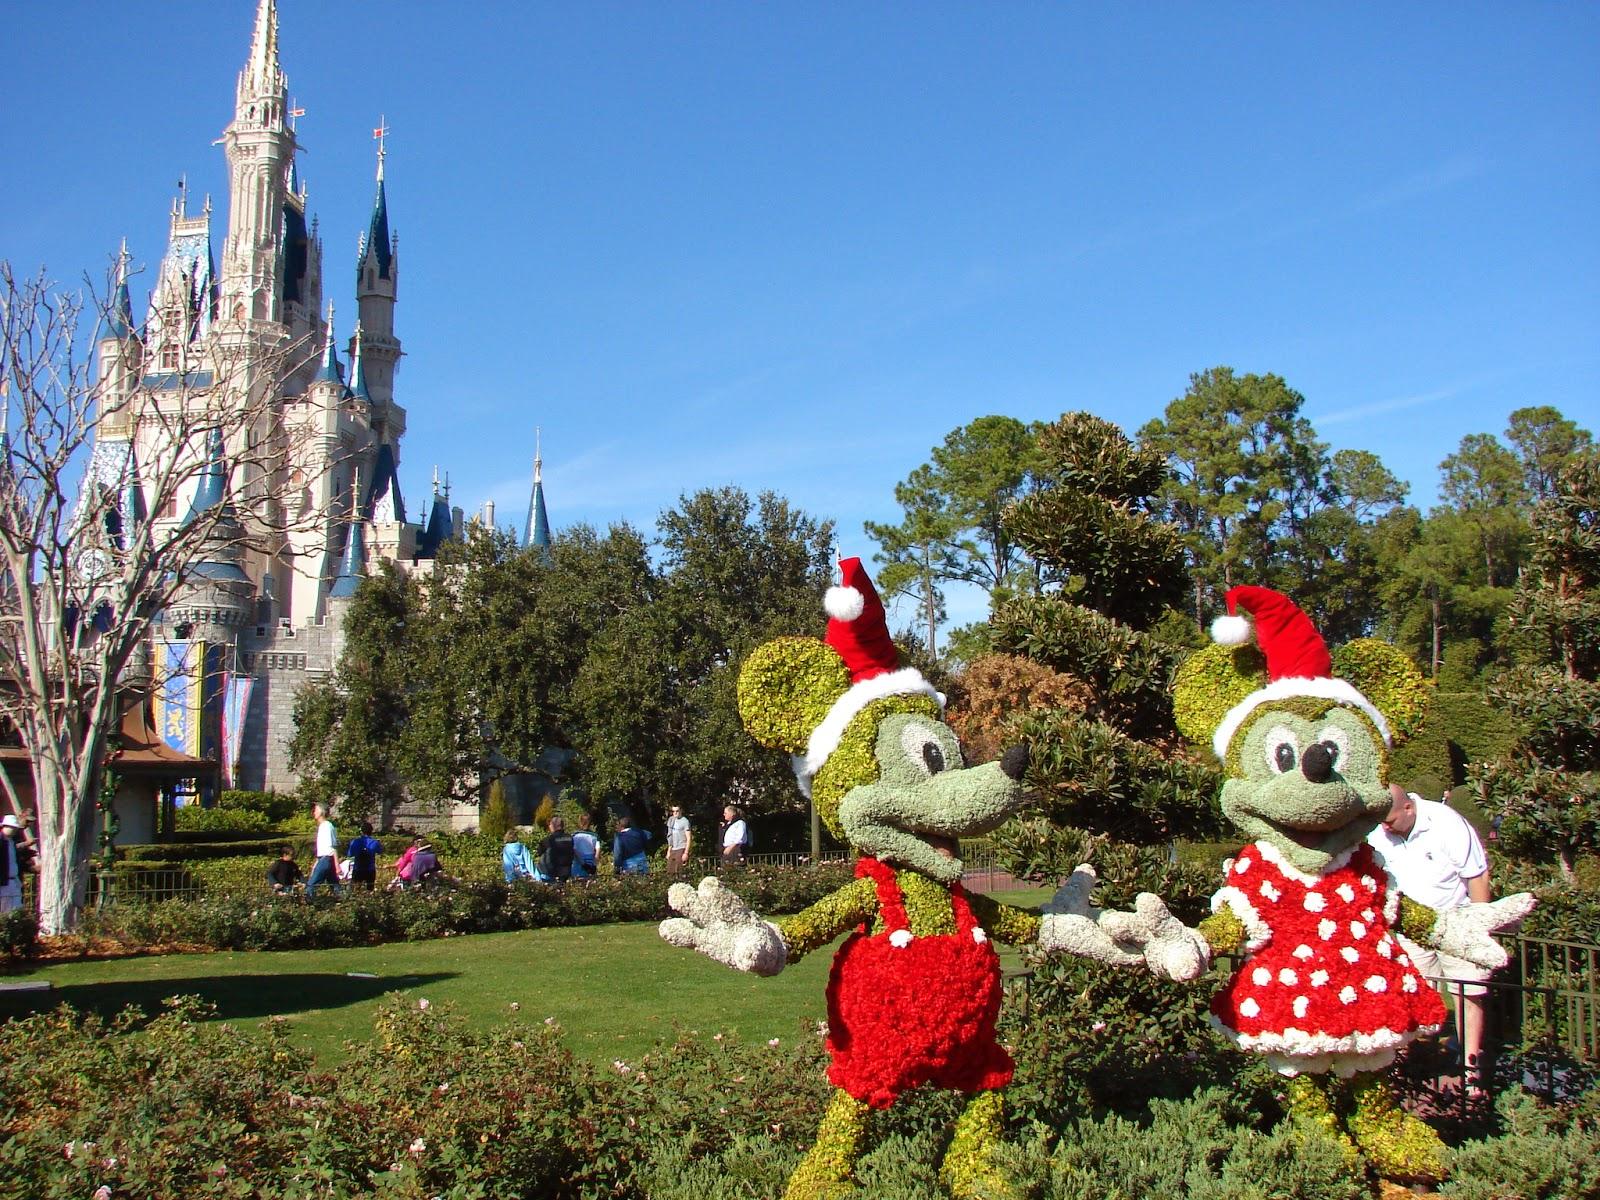 Disney's Magic Kingdom Christmas Decorations 2018 – easyWDW